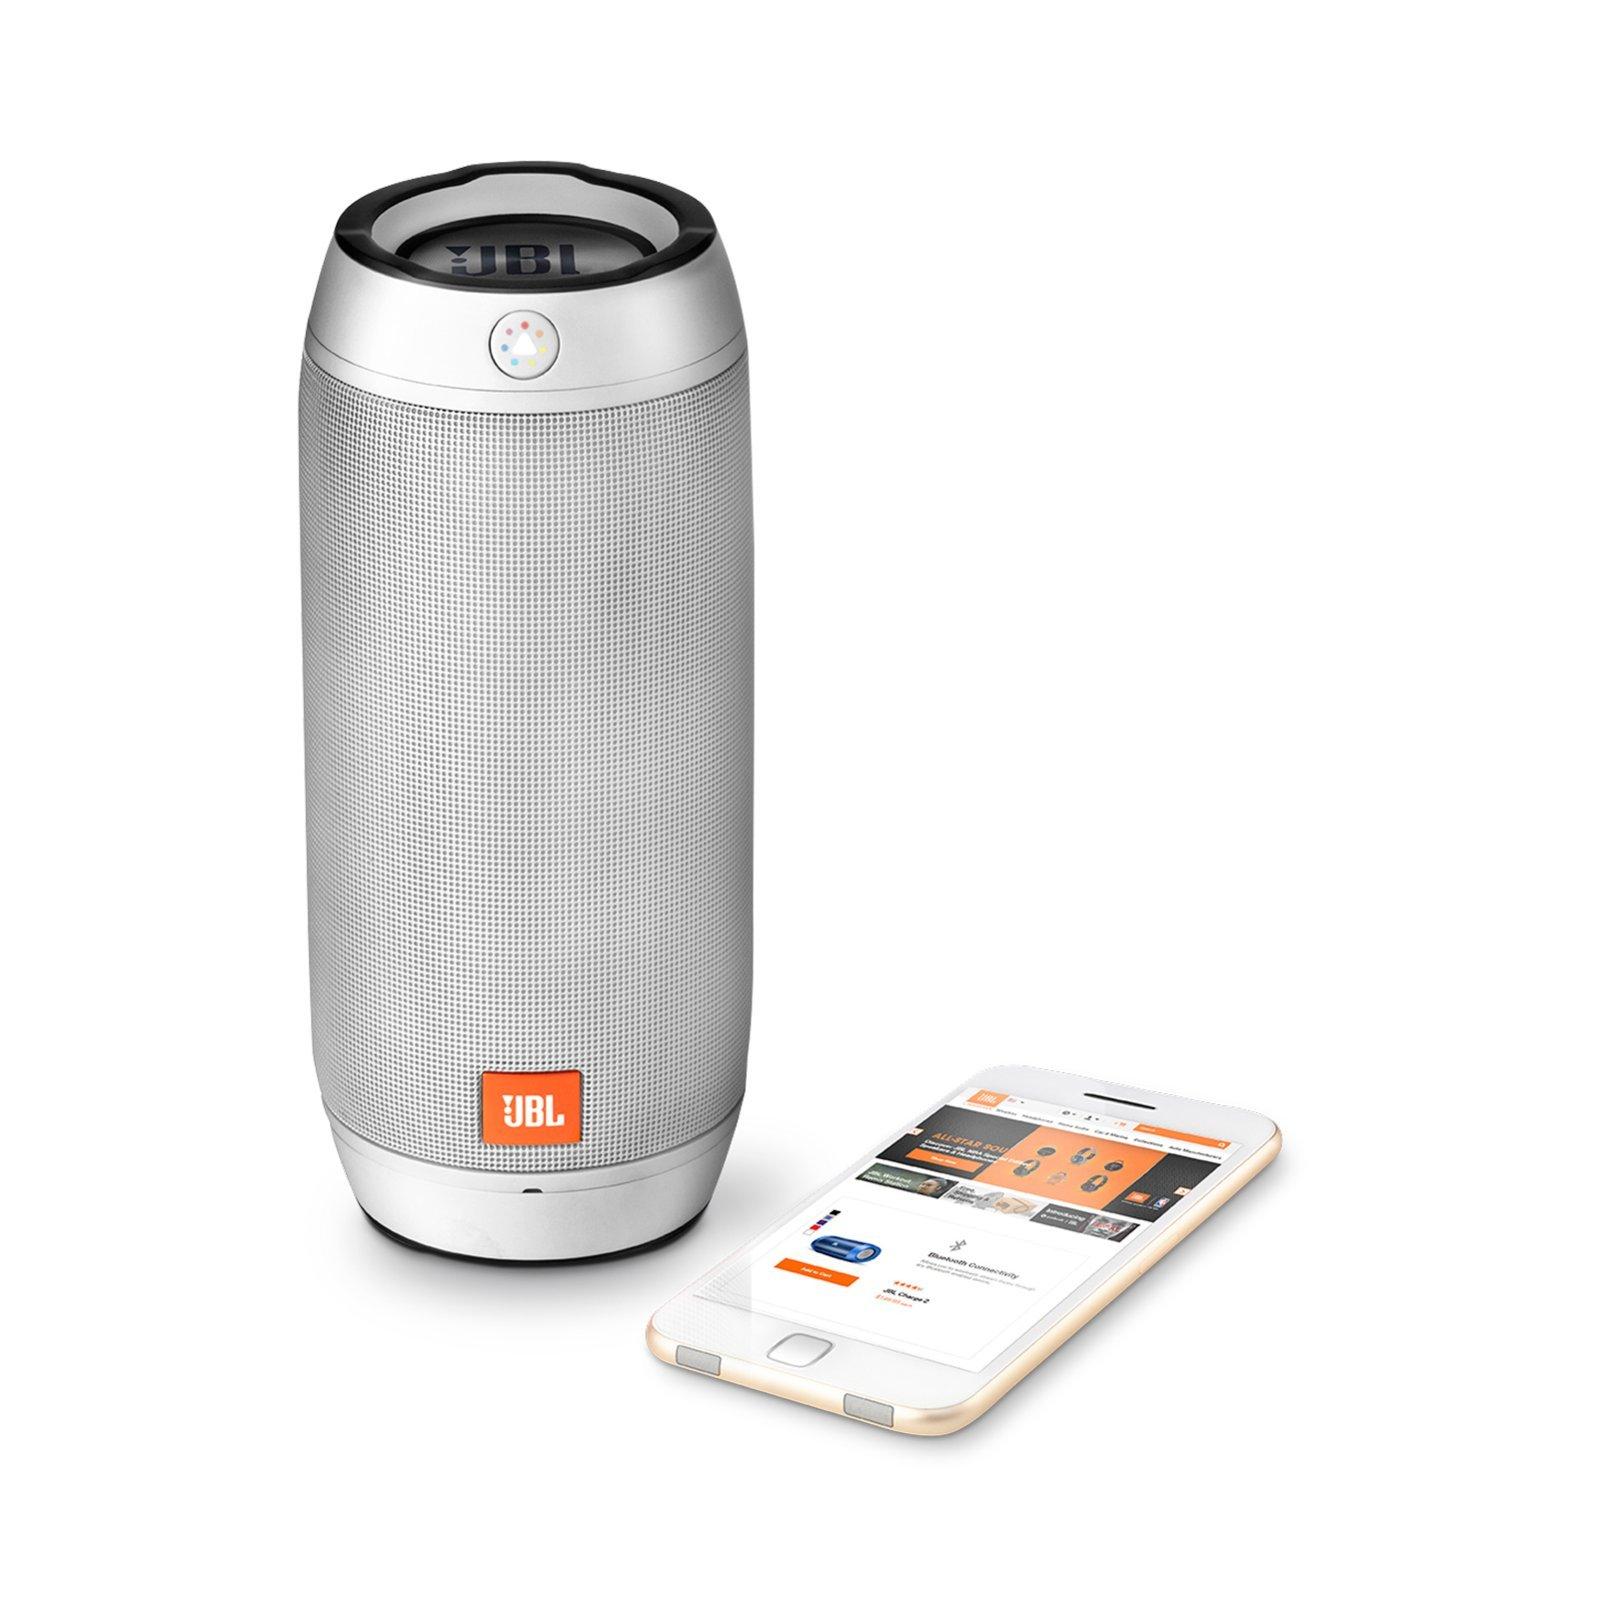 JBL Pulse 2 Portable Splashproof Bluetooth Speaker (Silver) by JBL (Image #3)